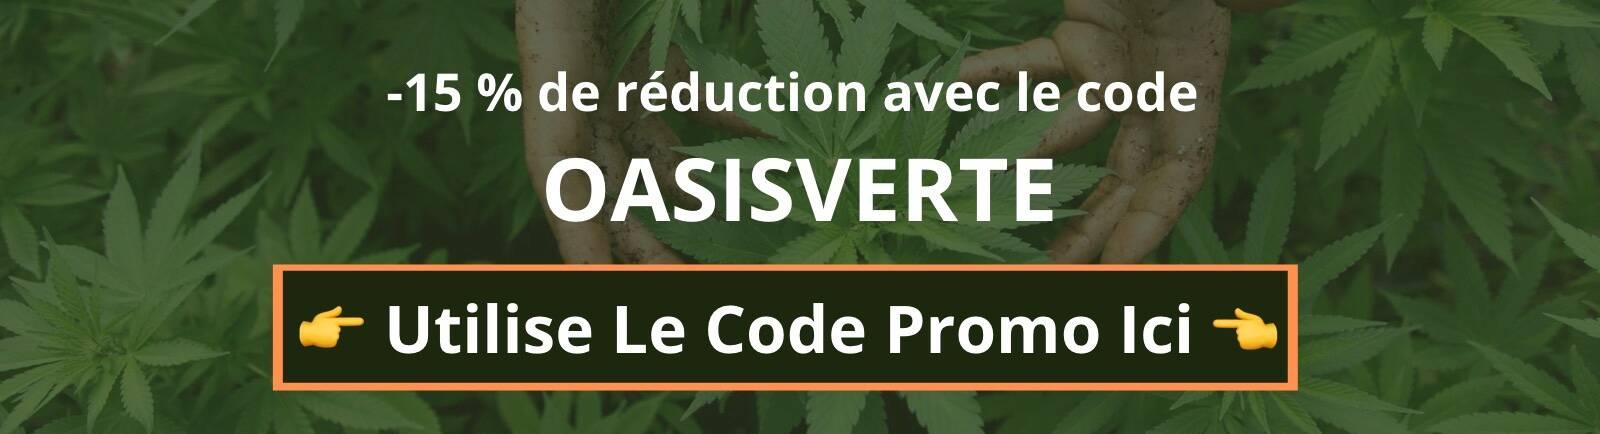 code promo la ferme du cbd code promo